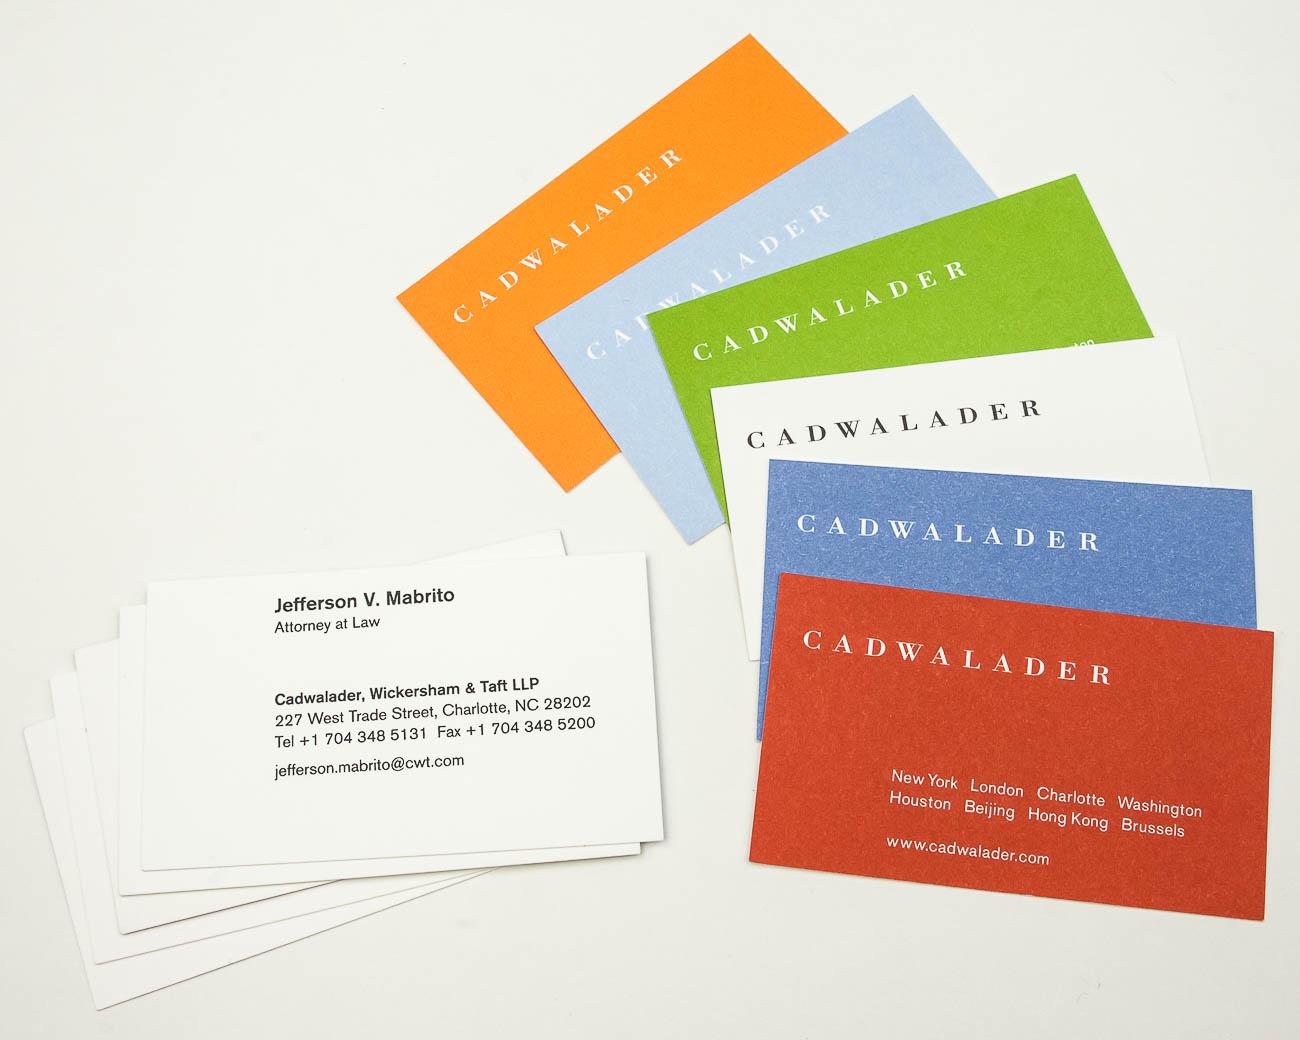 Precise Continental Cadwalader Business Cards - Precise Continental